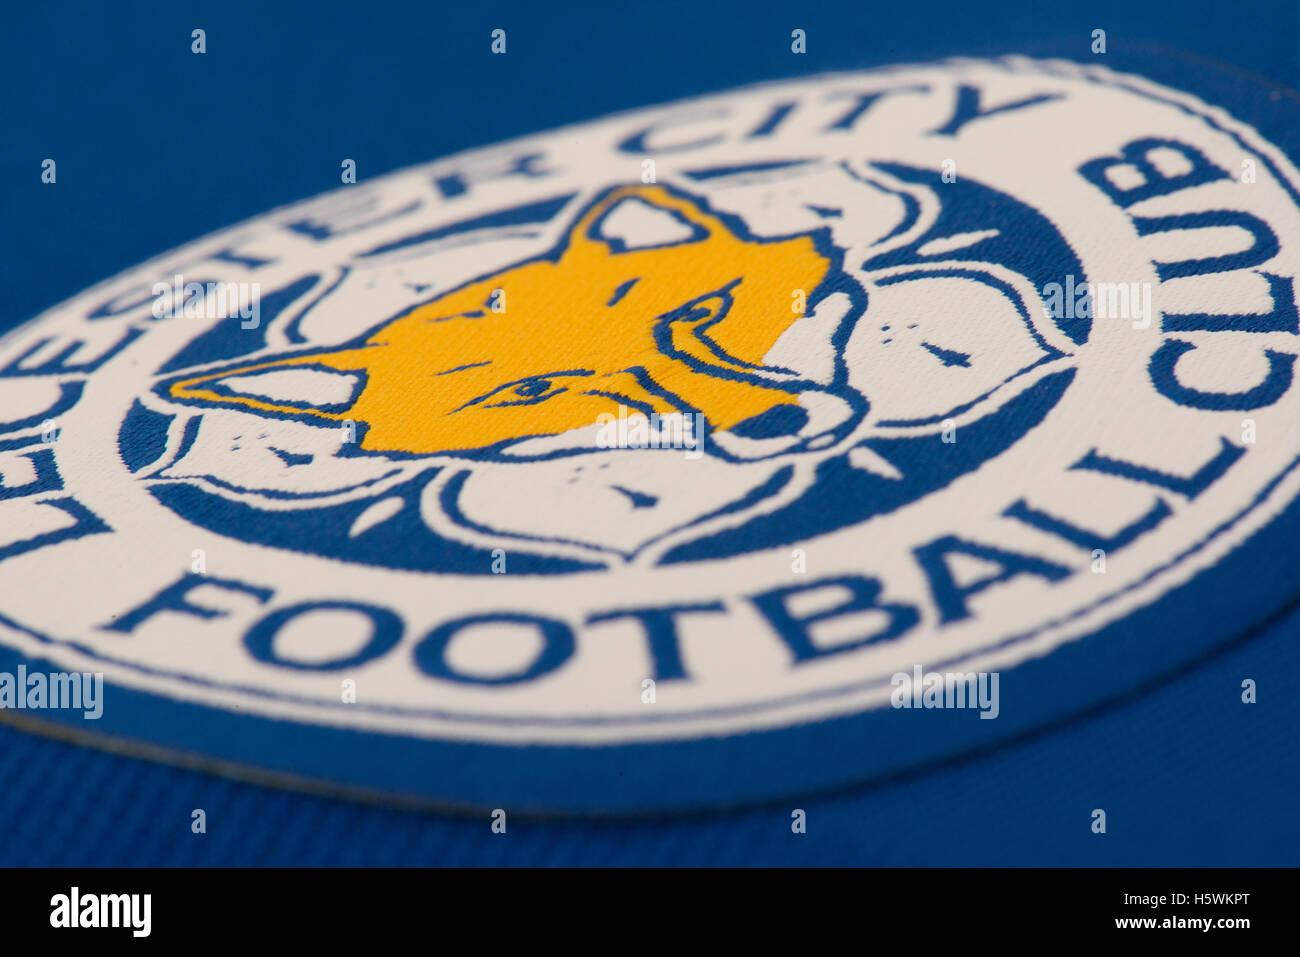 Premier League Champions Leicester City football club badge